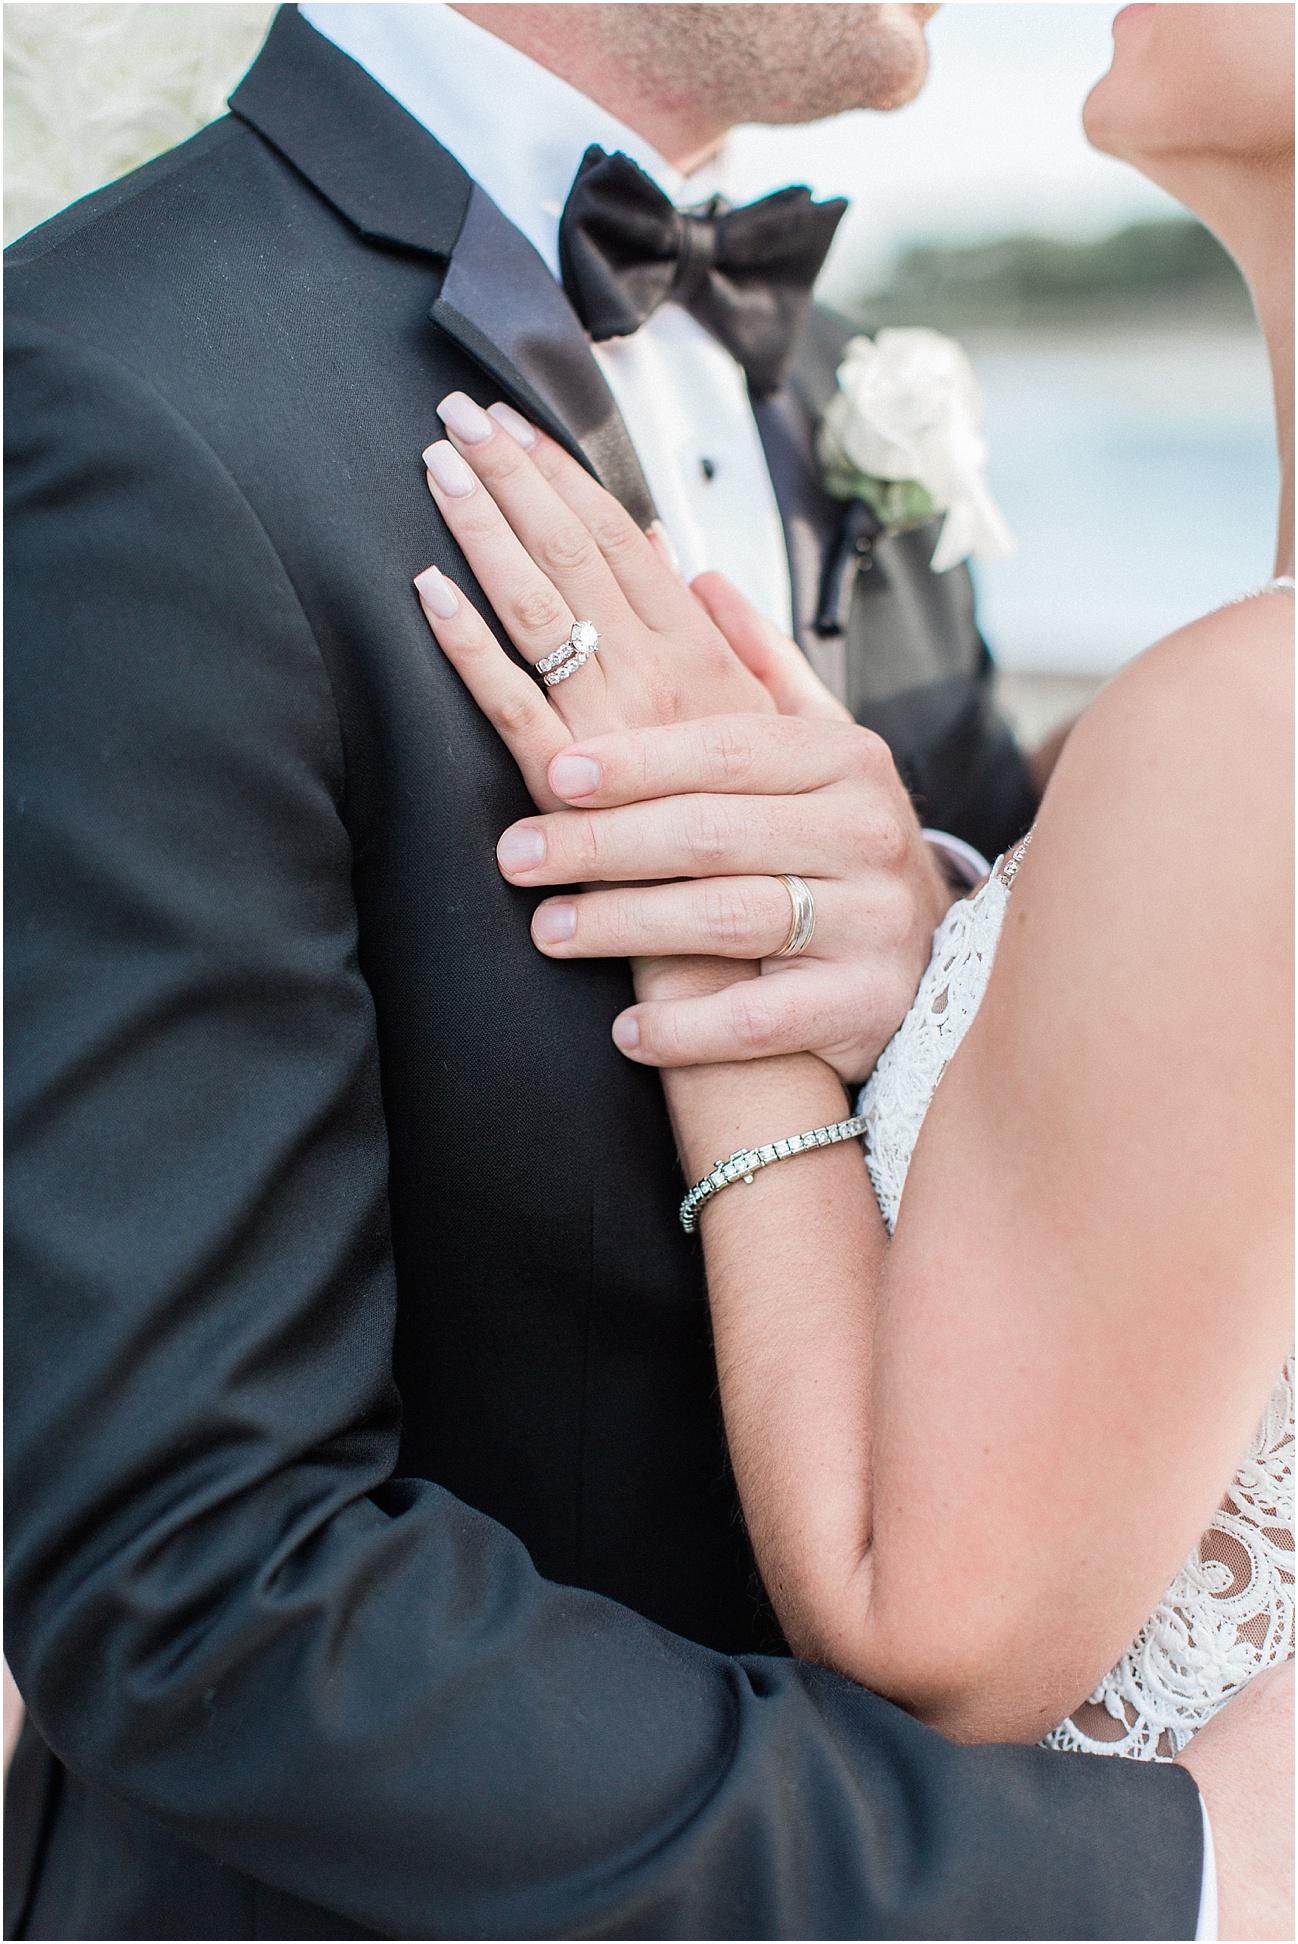 bianca_chris_danversport_italian_blush_gold_north_shore_cape_cod_boston_wedding_photographer_meredith_jane_photography_photo_1138.jpg